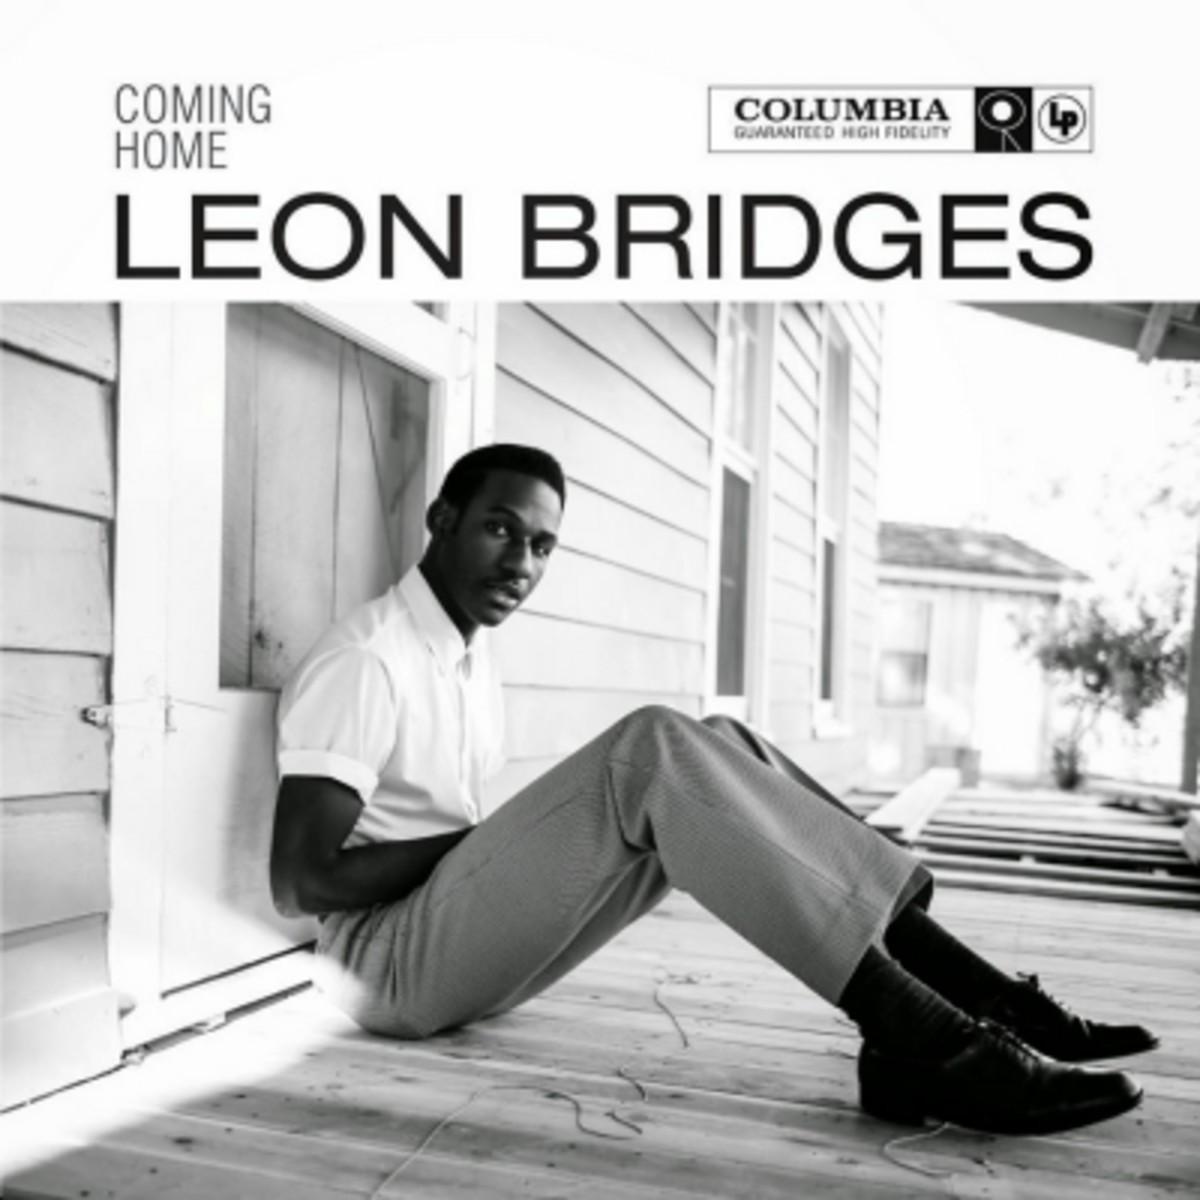 leon-bridges-coming-home.jpg